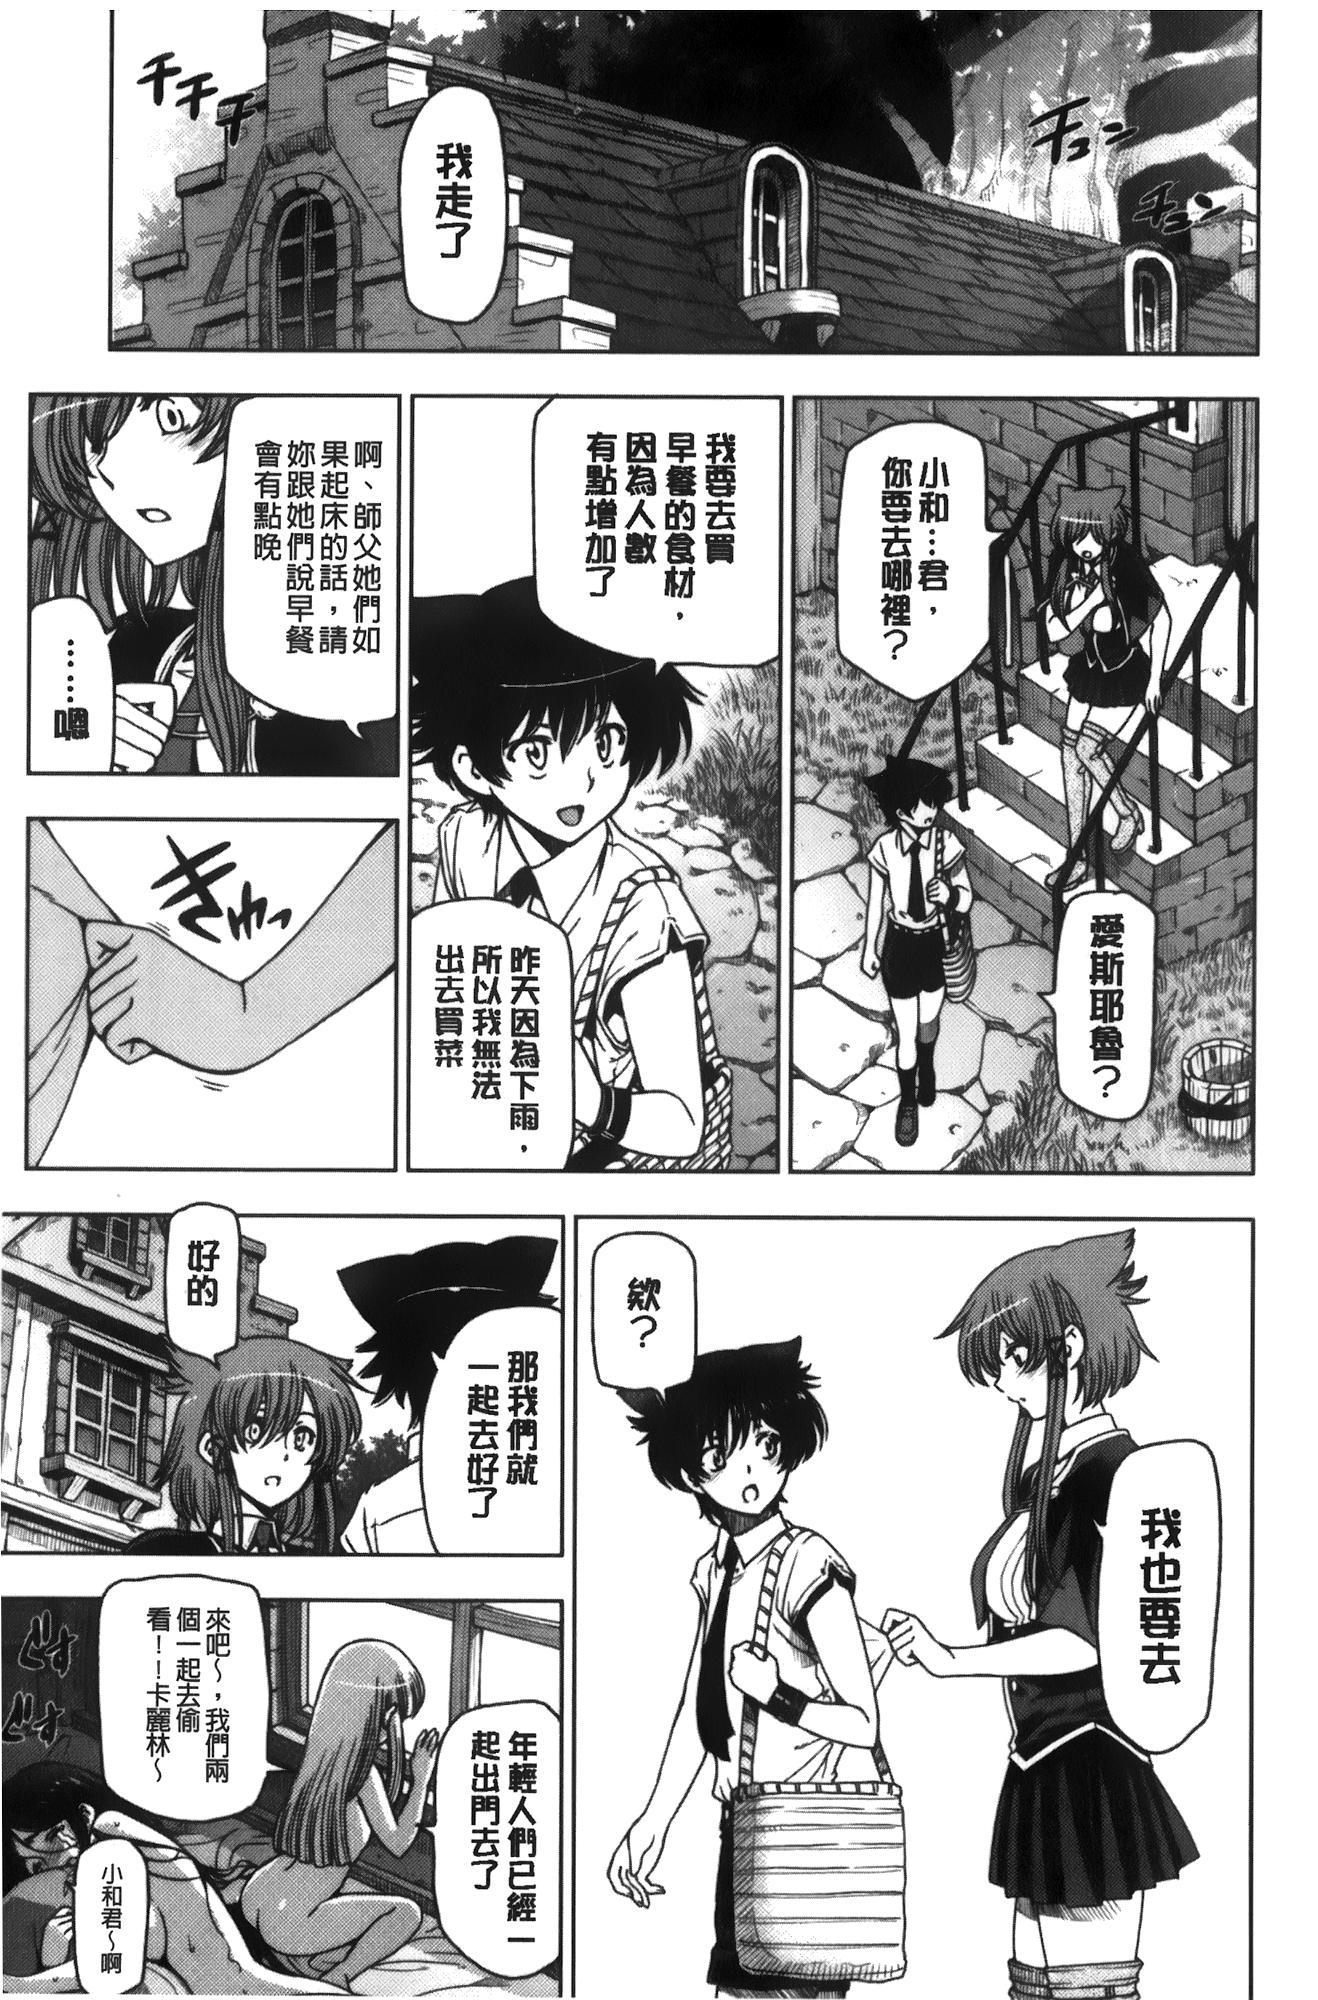 Majo × Shota ~ Genteiban | 魔女X小正太 限定版 177